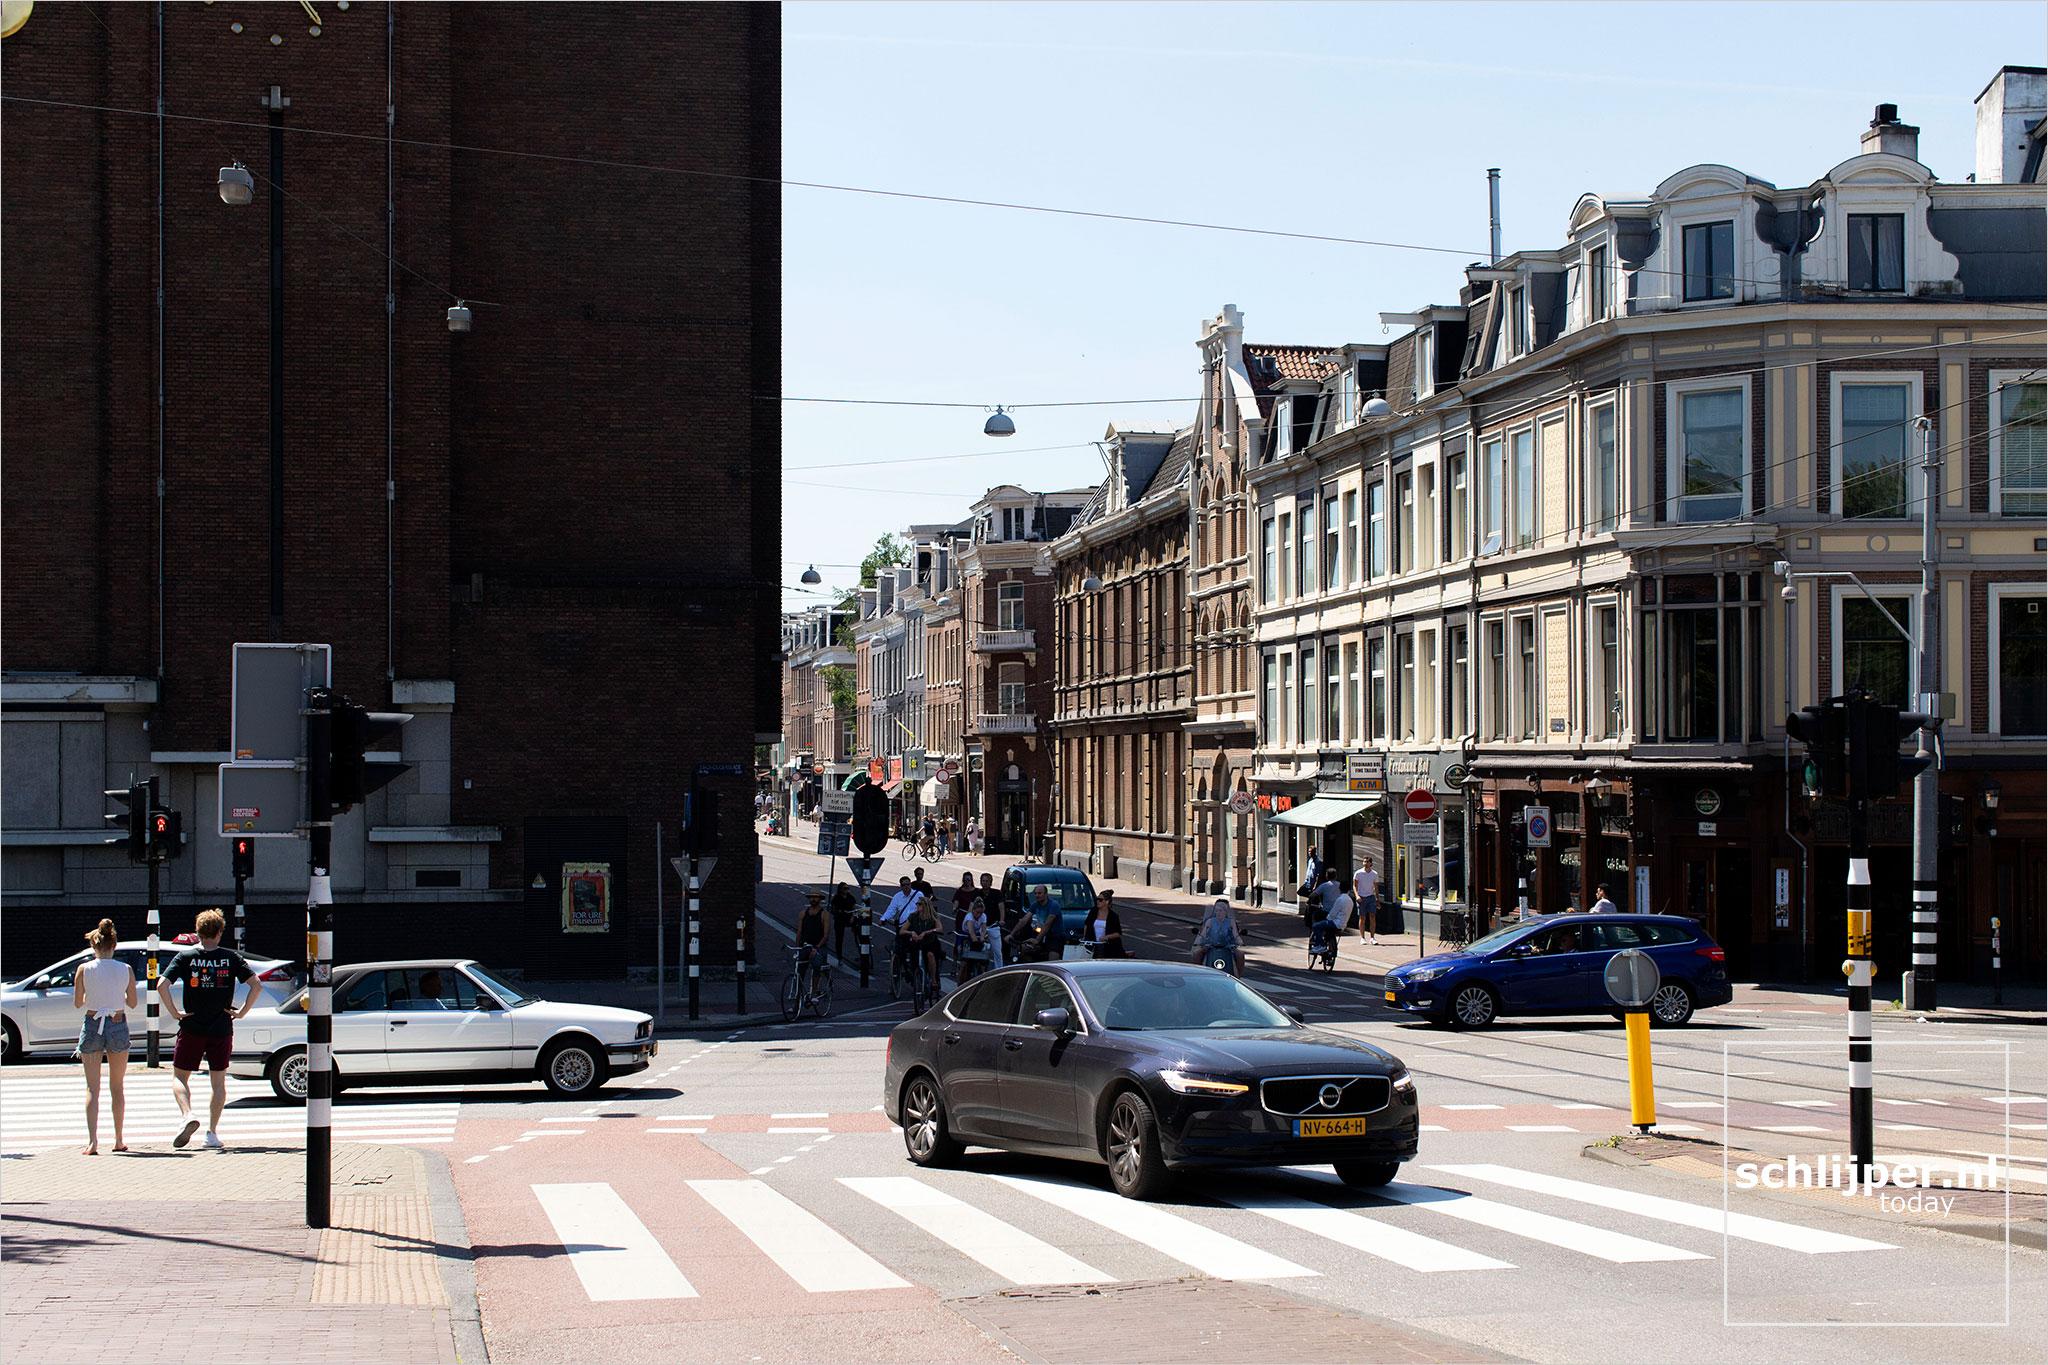 Nederland, Amsterdam, 23 juni 2020